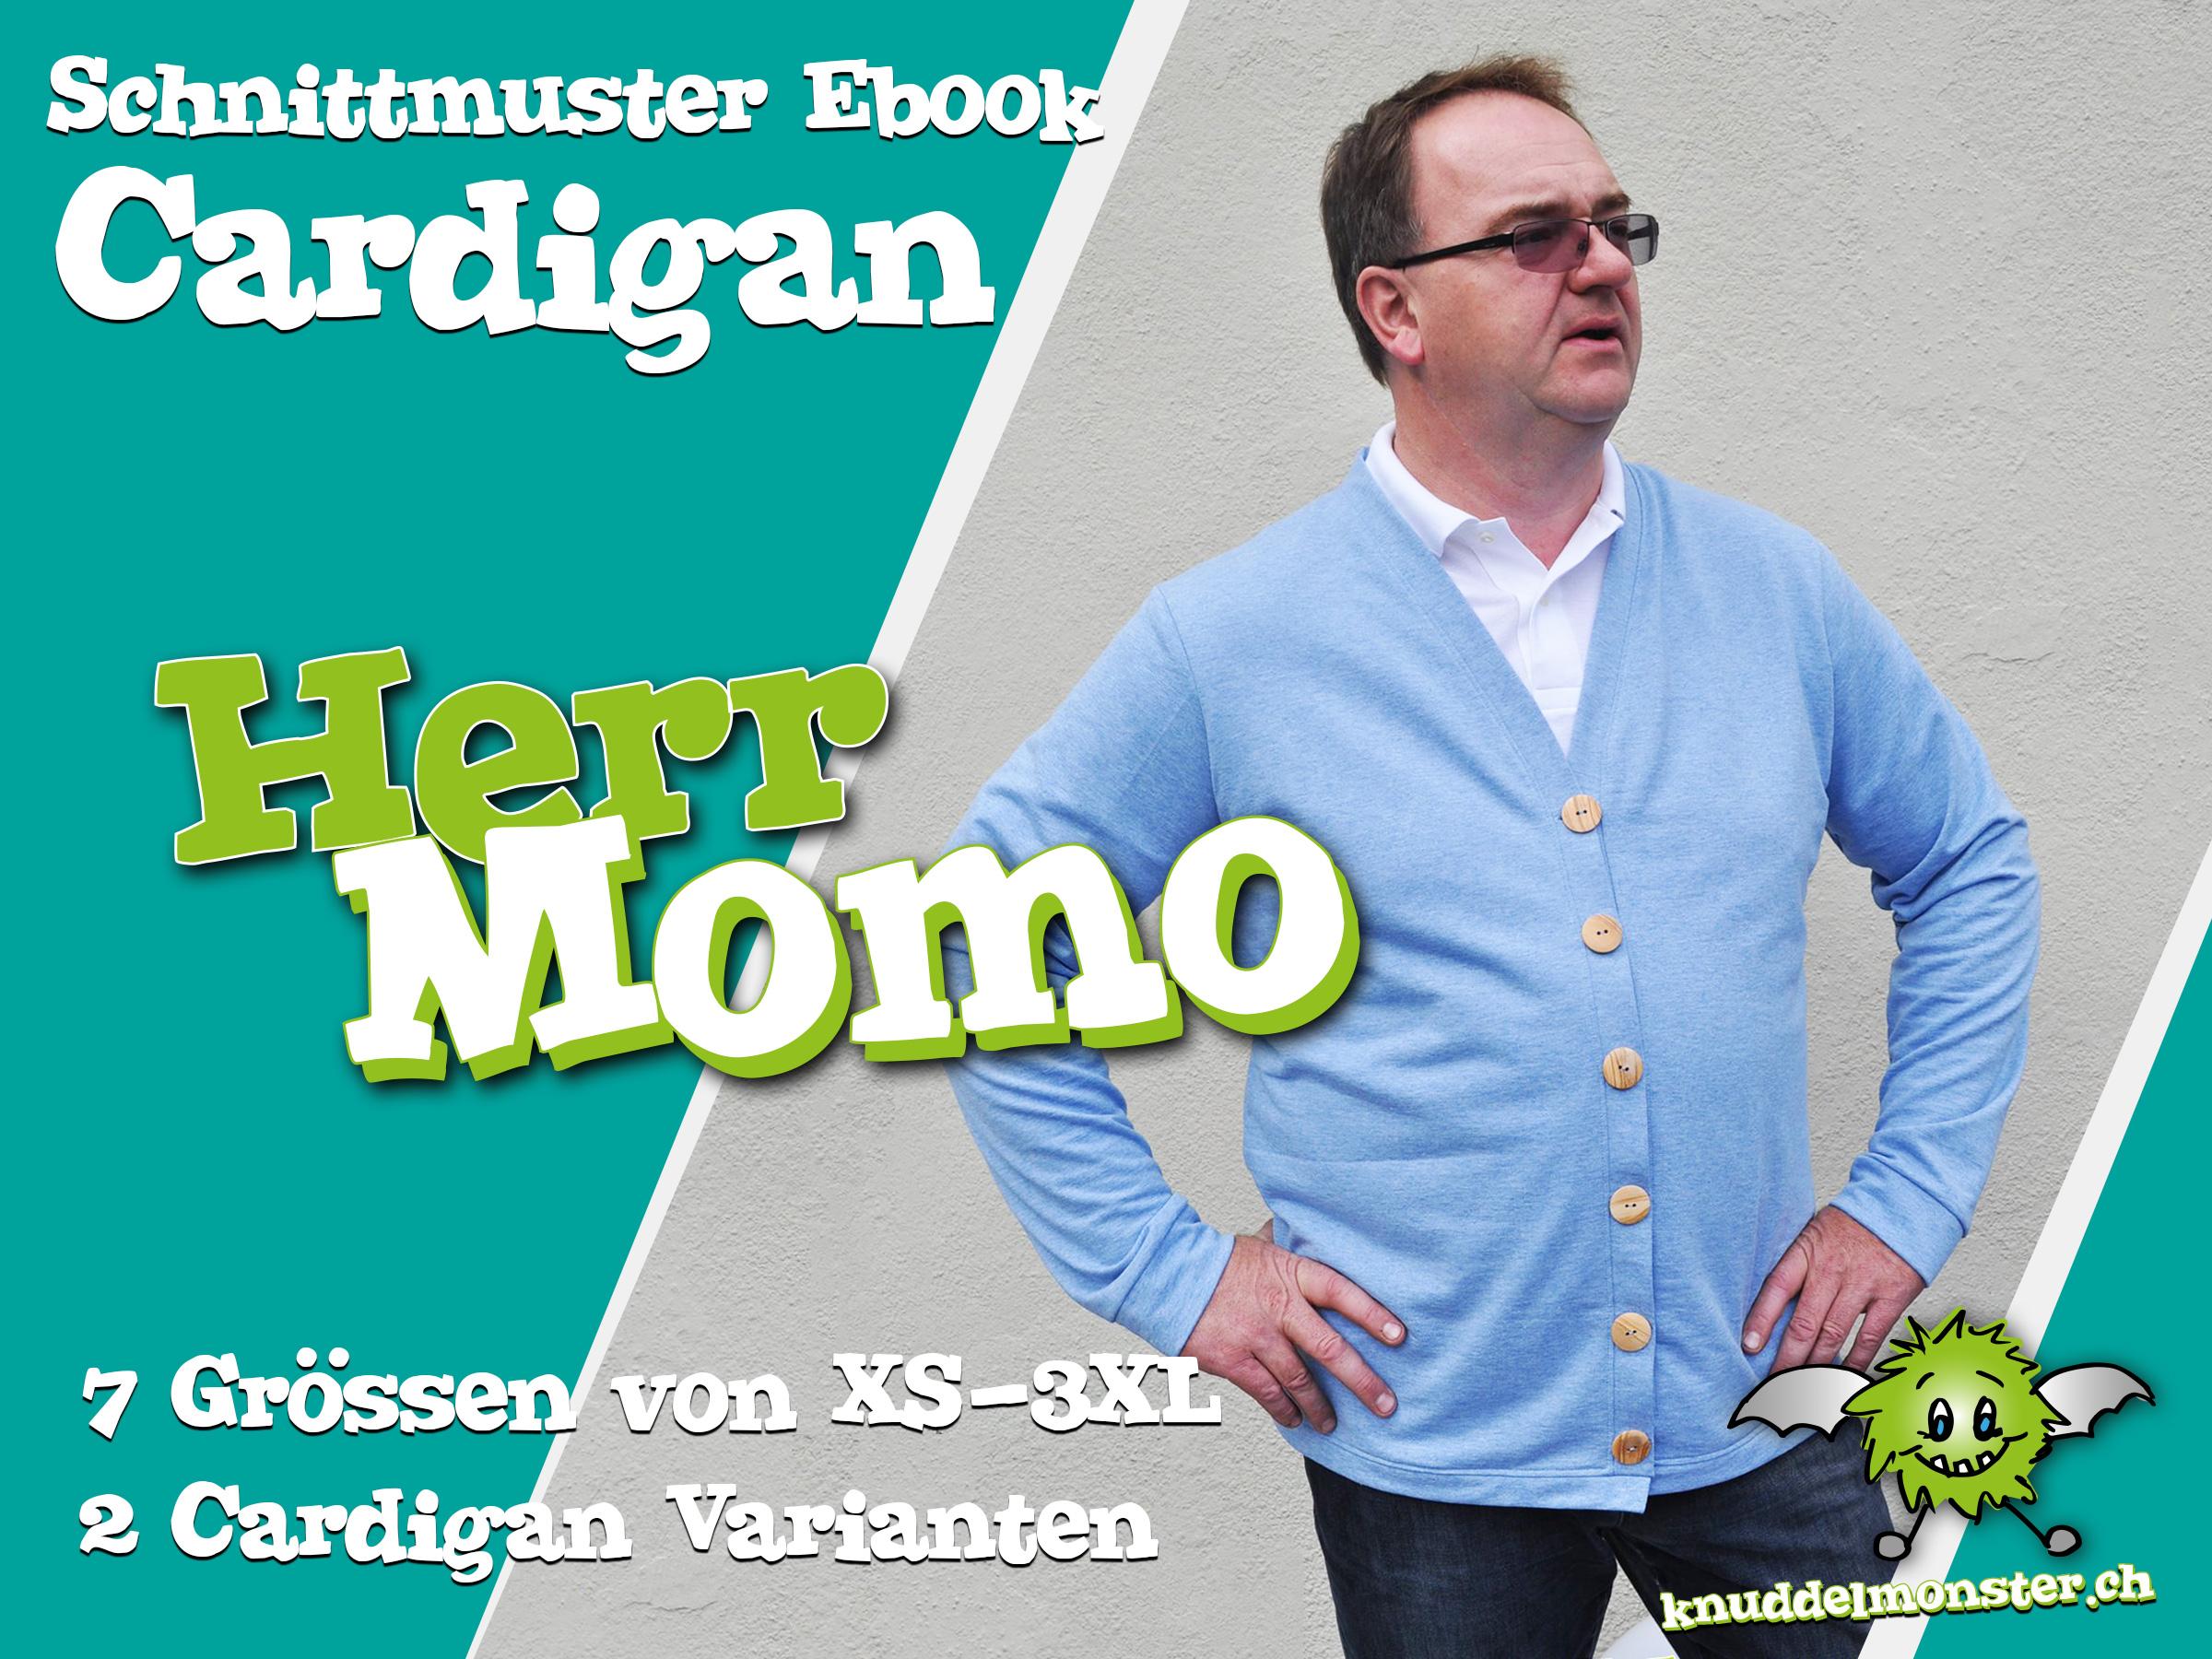 Schnittmuster – Cardigan Herr Momo – Grössen: XS – 3XL | Knuddelmonster